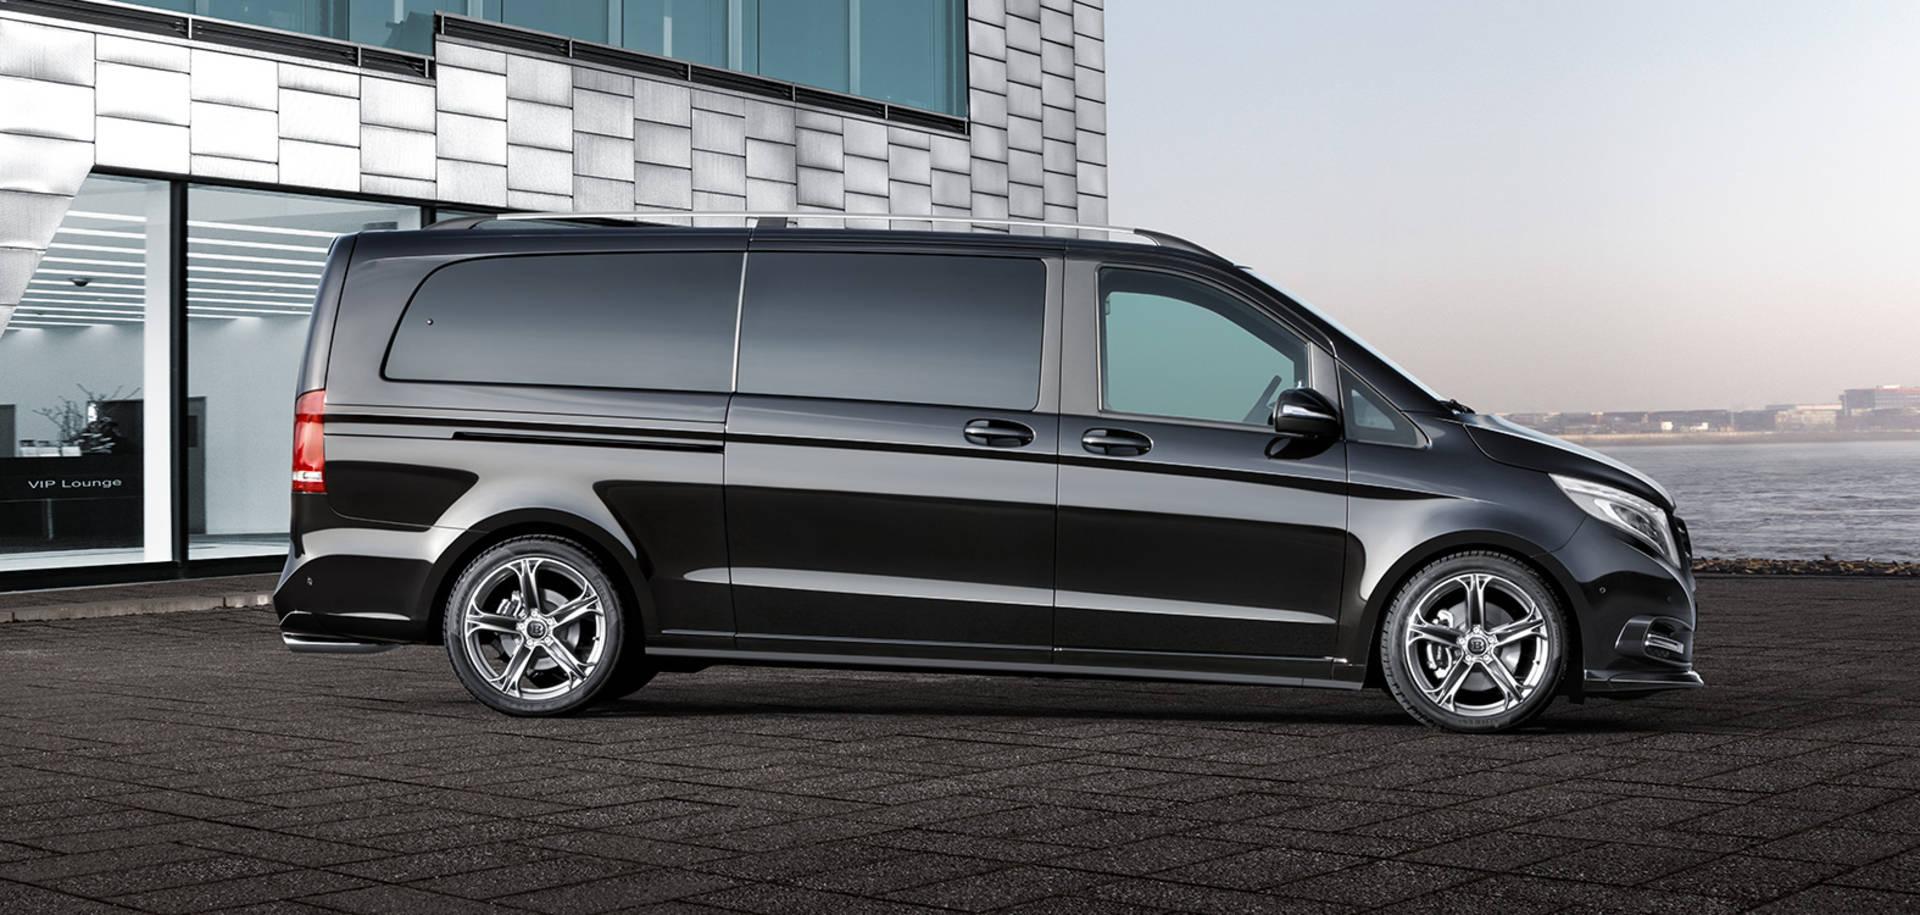 luxury minivan hire prague